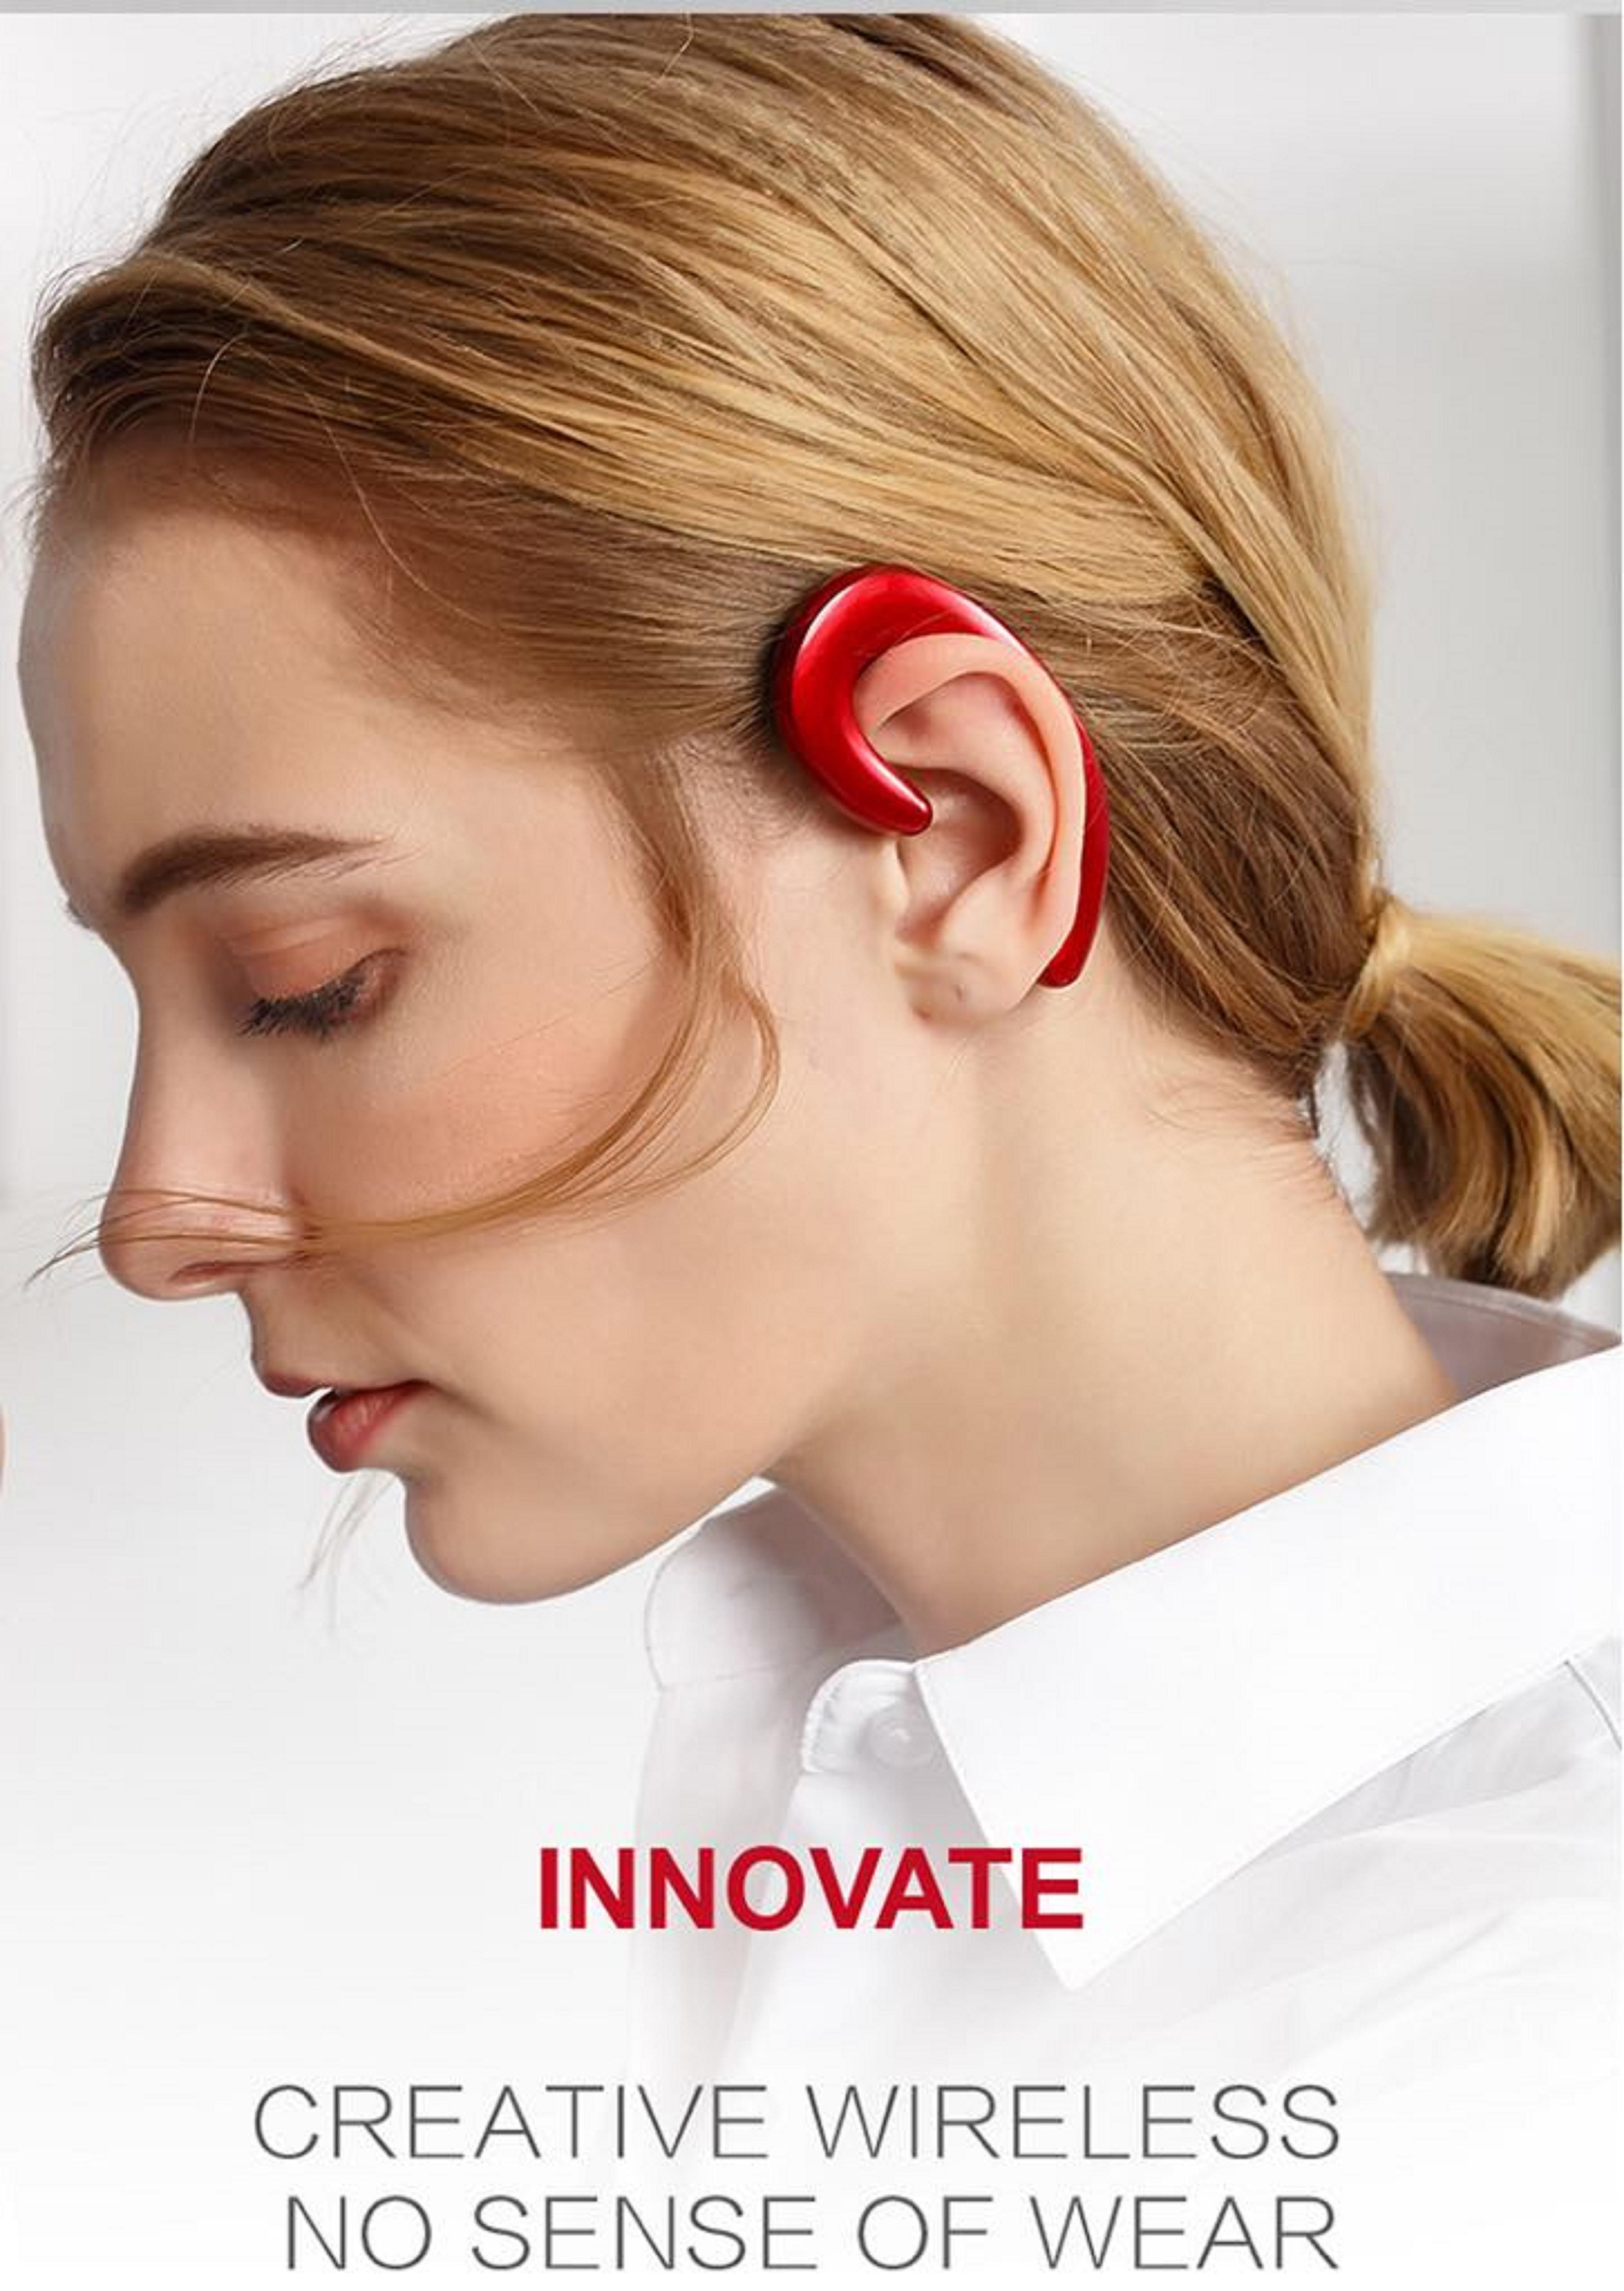 Tai nghe Bluetooth treo tai S103  Màu Đỏ